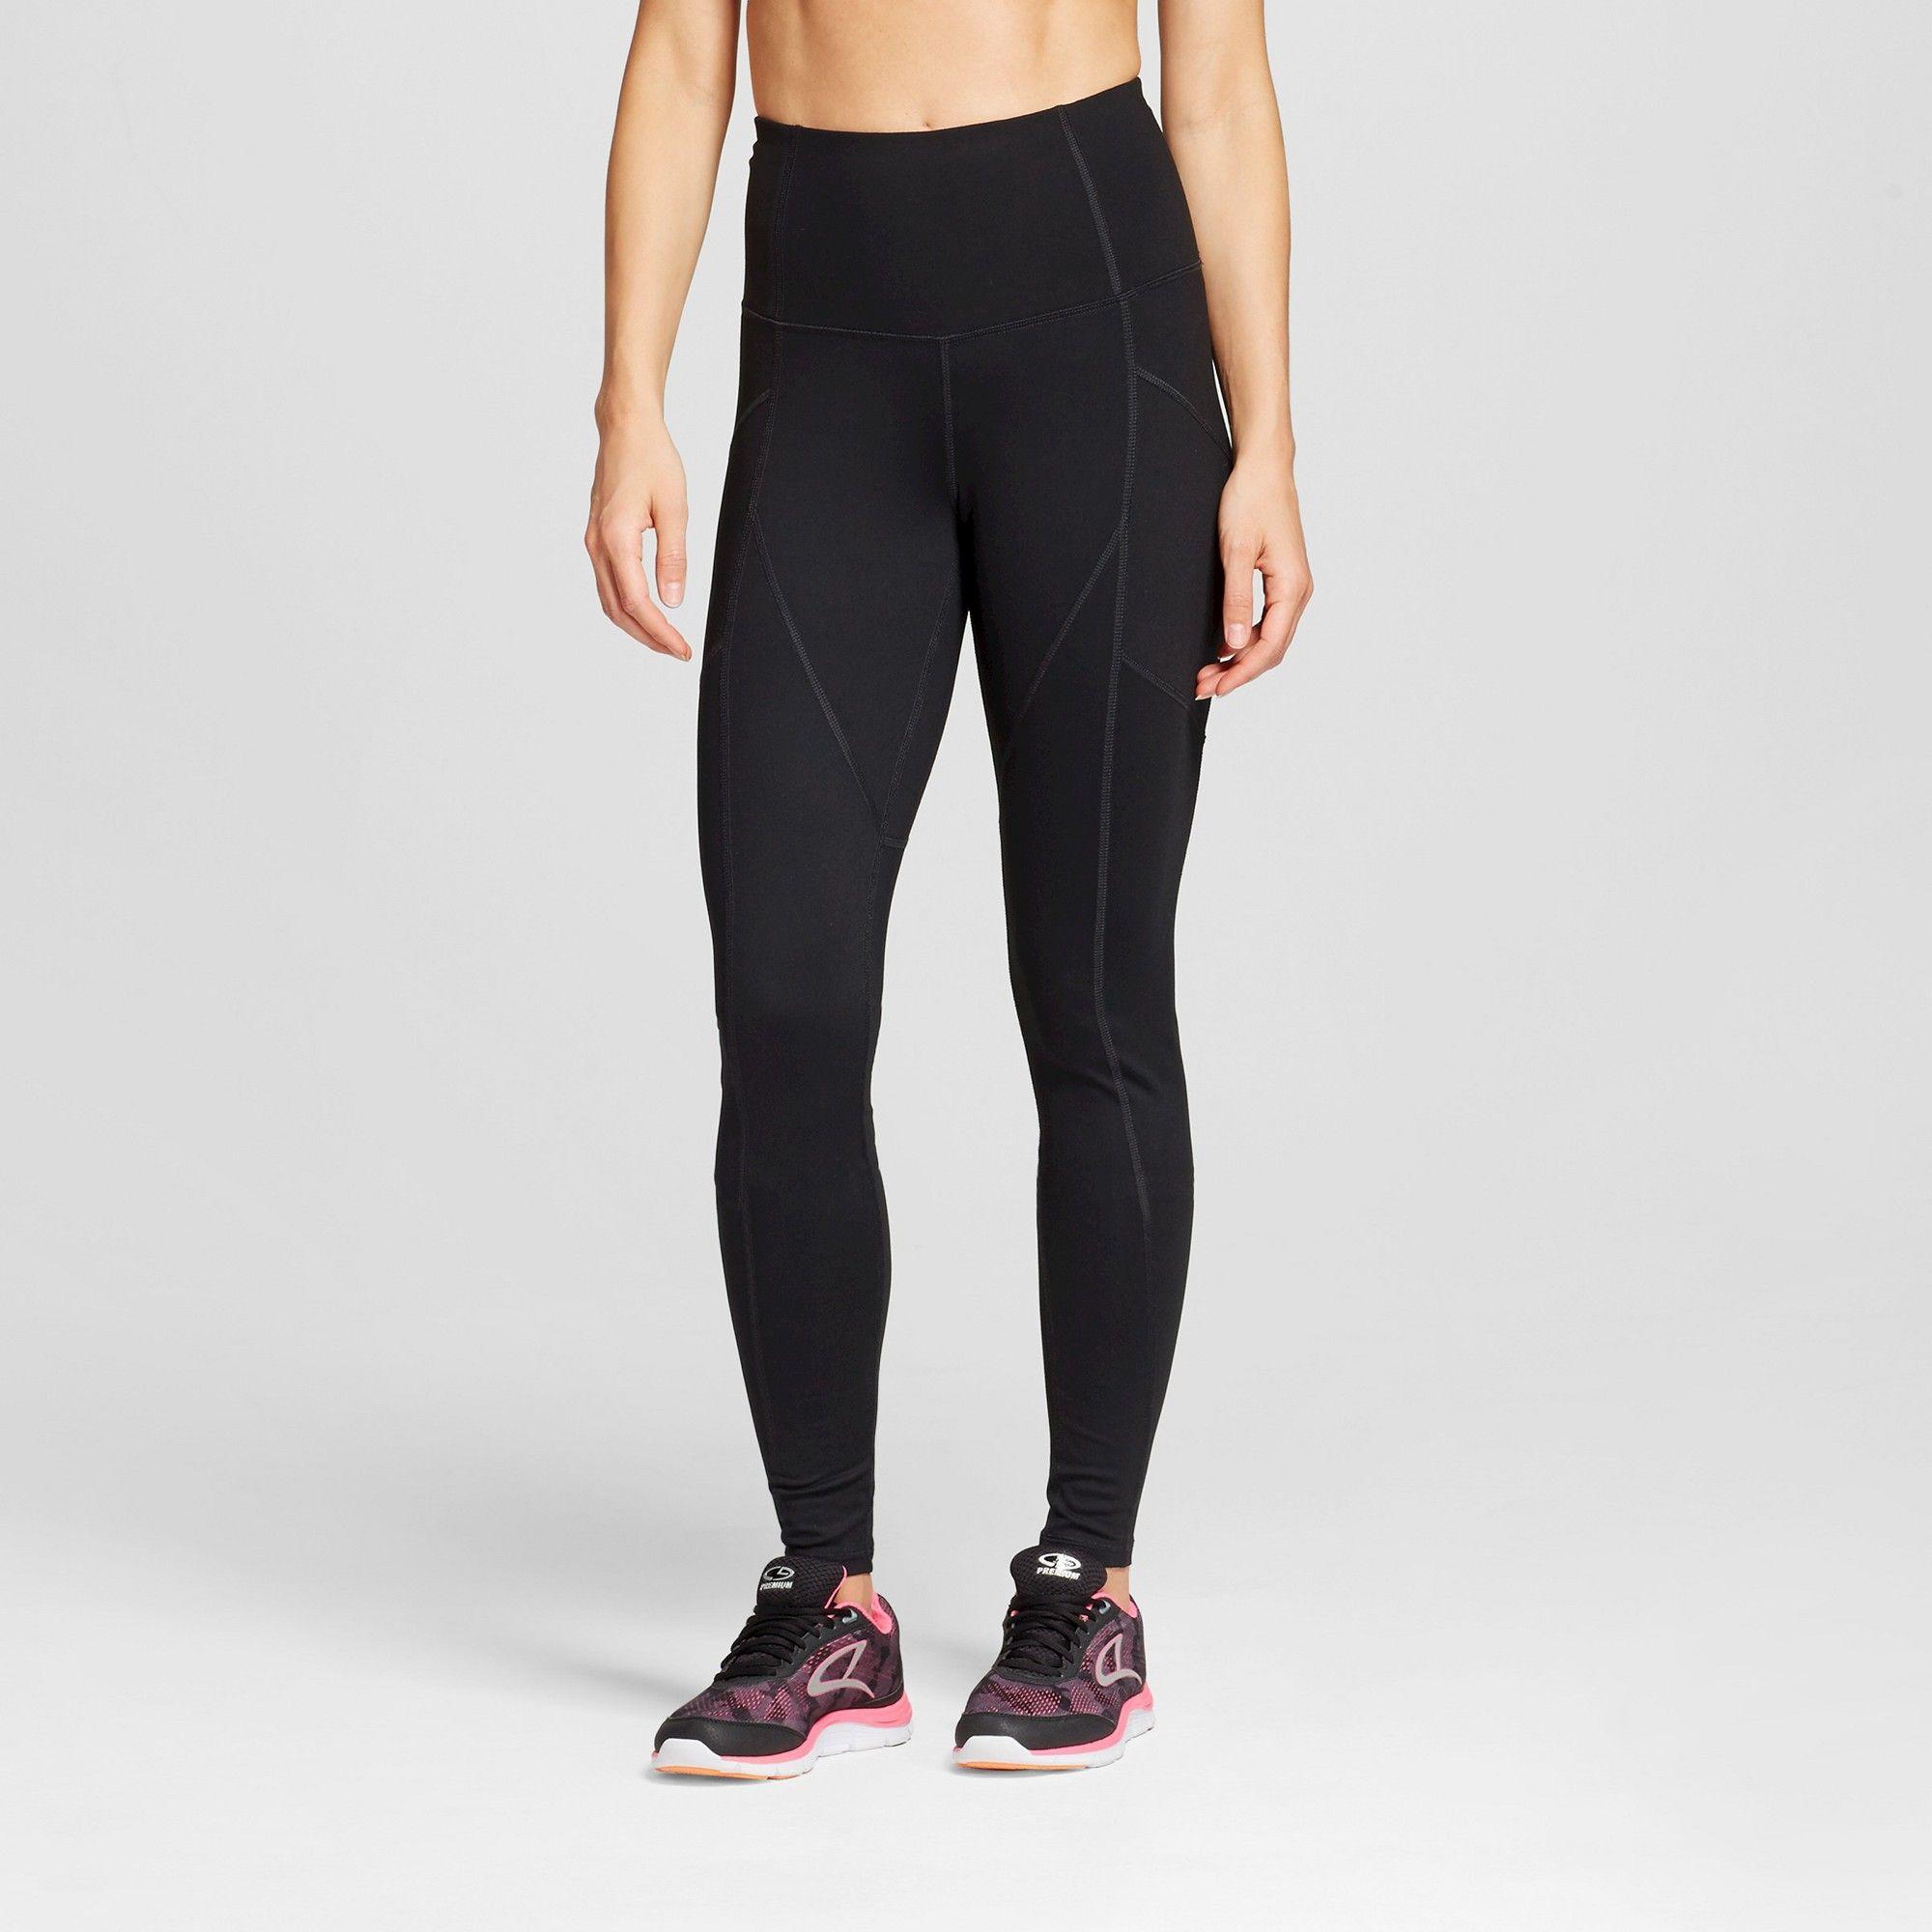 6ab24619fba53 Women's Flawless High Waisted Tights - C9 Champion Black Xxl-Shorts, Size:  Xxl - Short